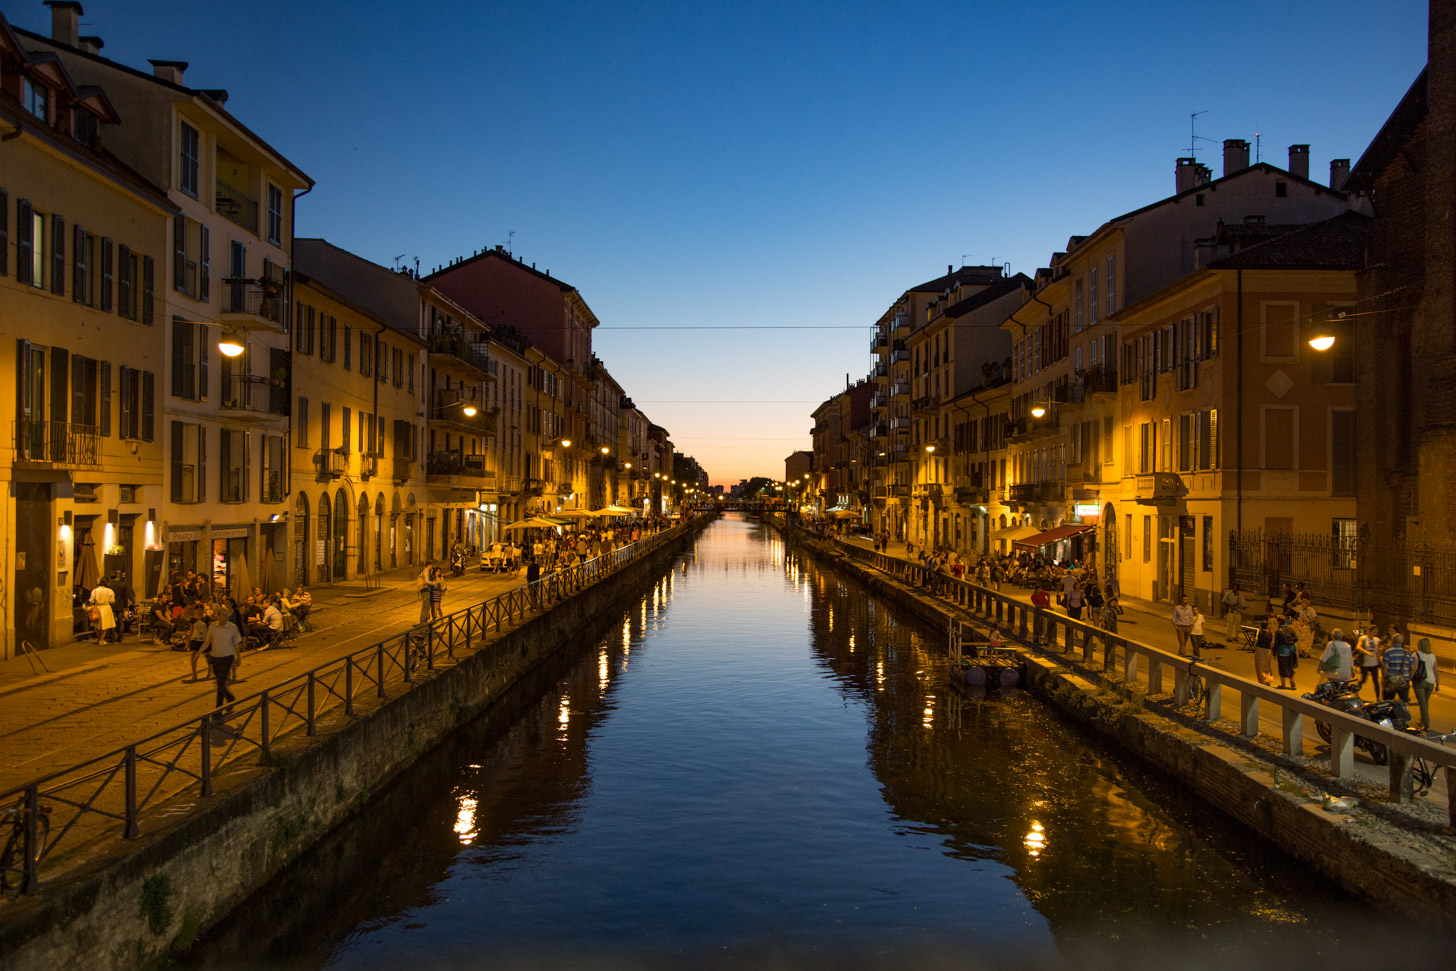 Kanaal in Navigli